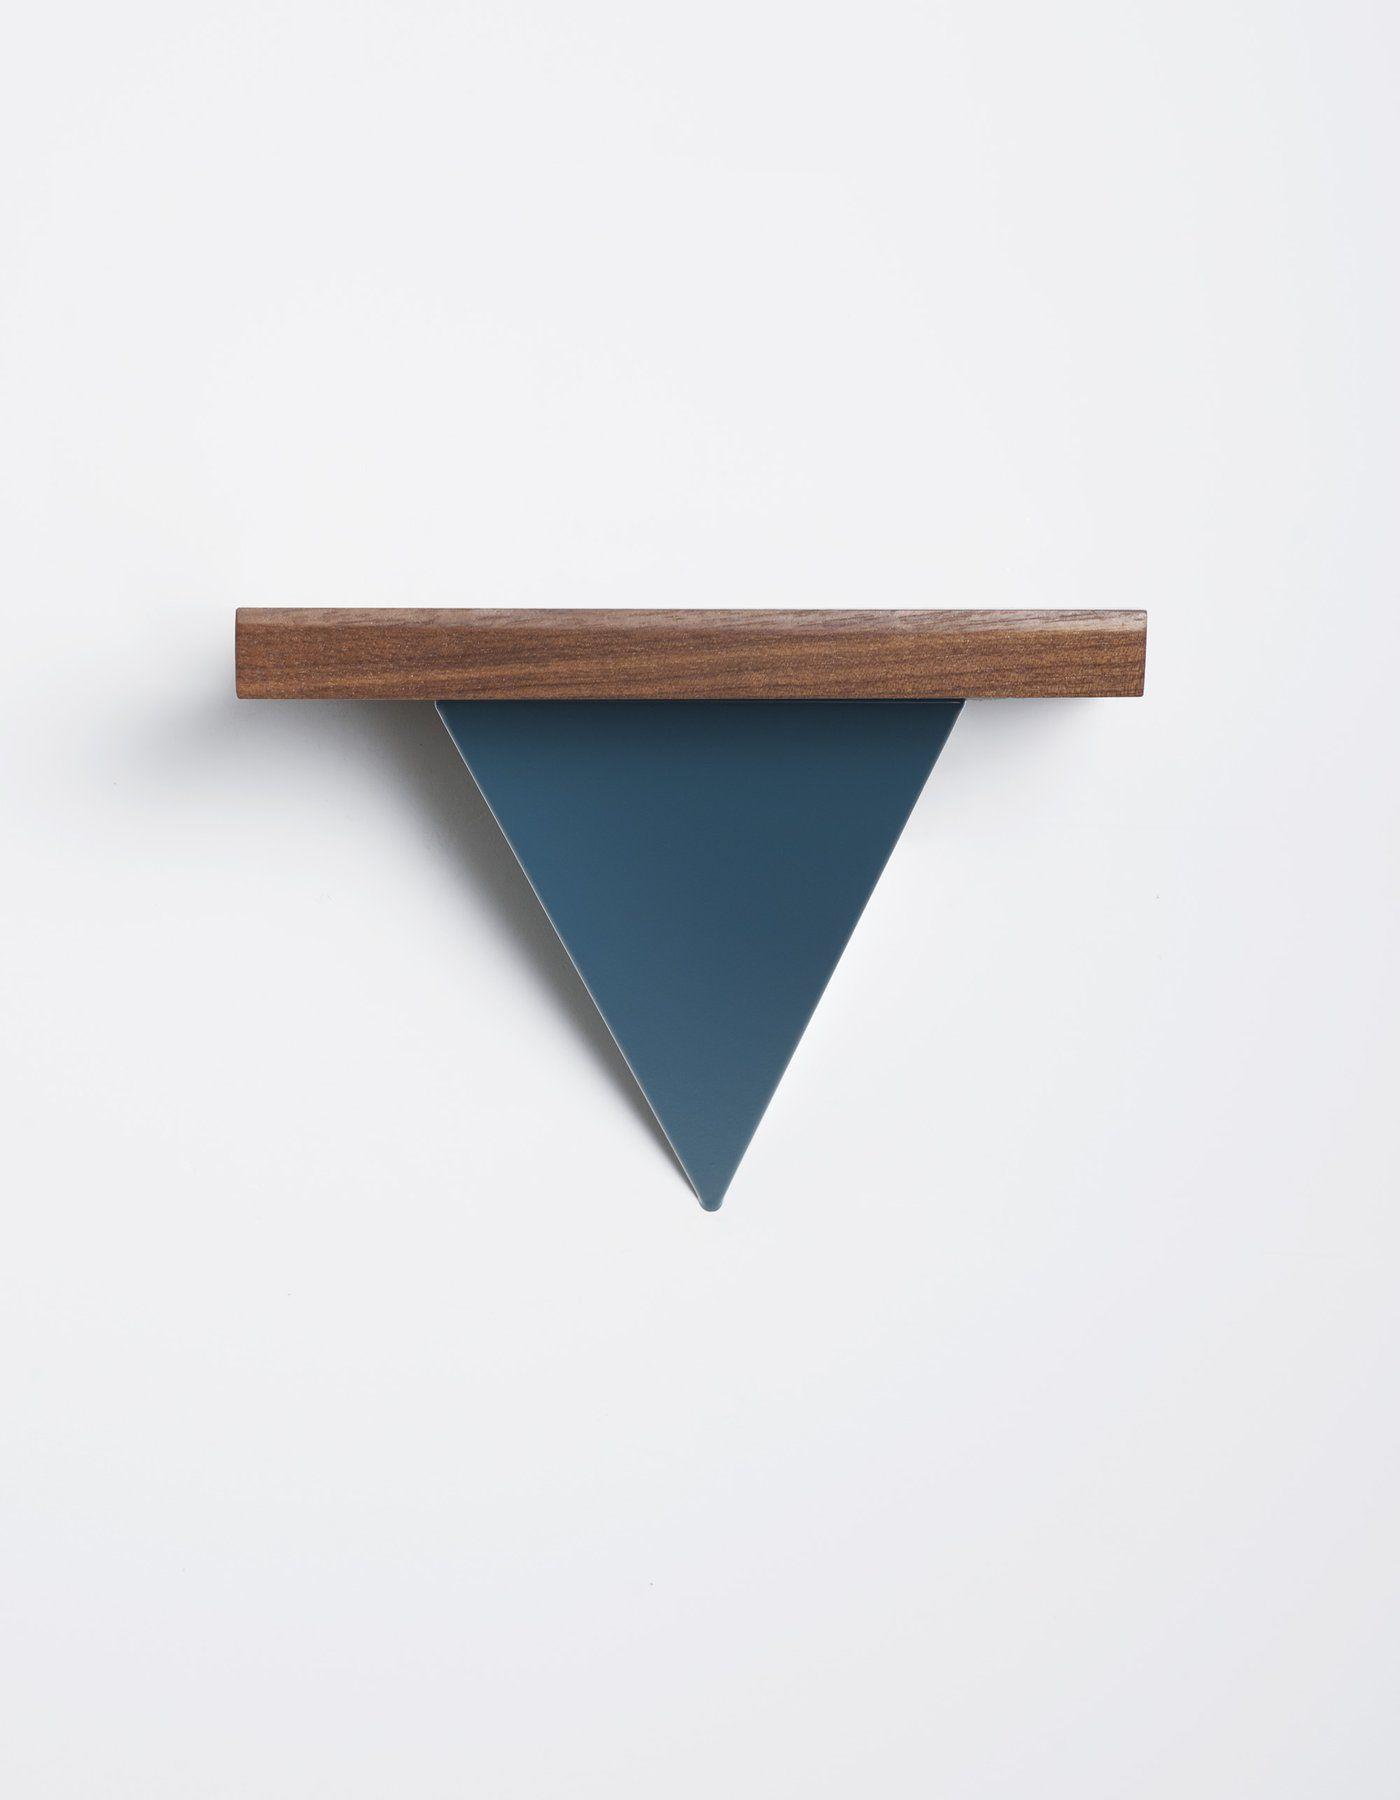 Pyramid Bracket In Teal Tortuga #Shelves #Shelving #Storagesolution #Pyramid #Geometric